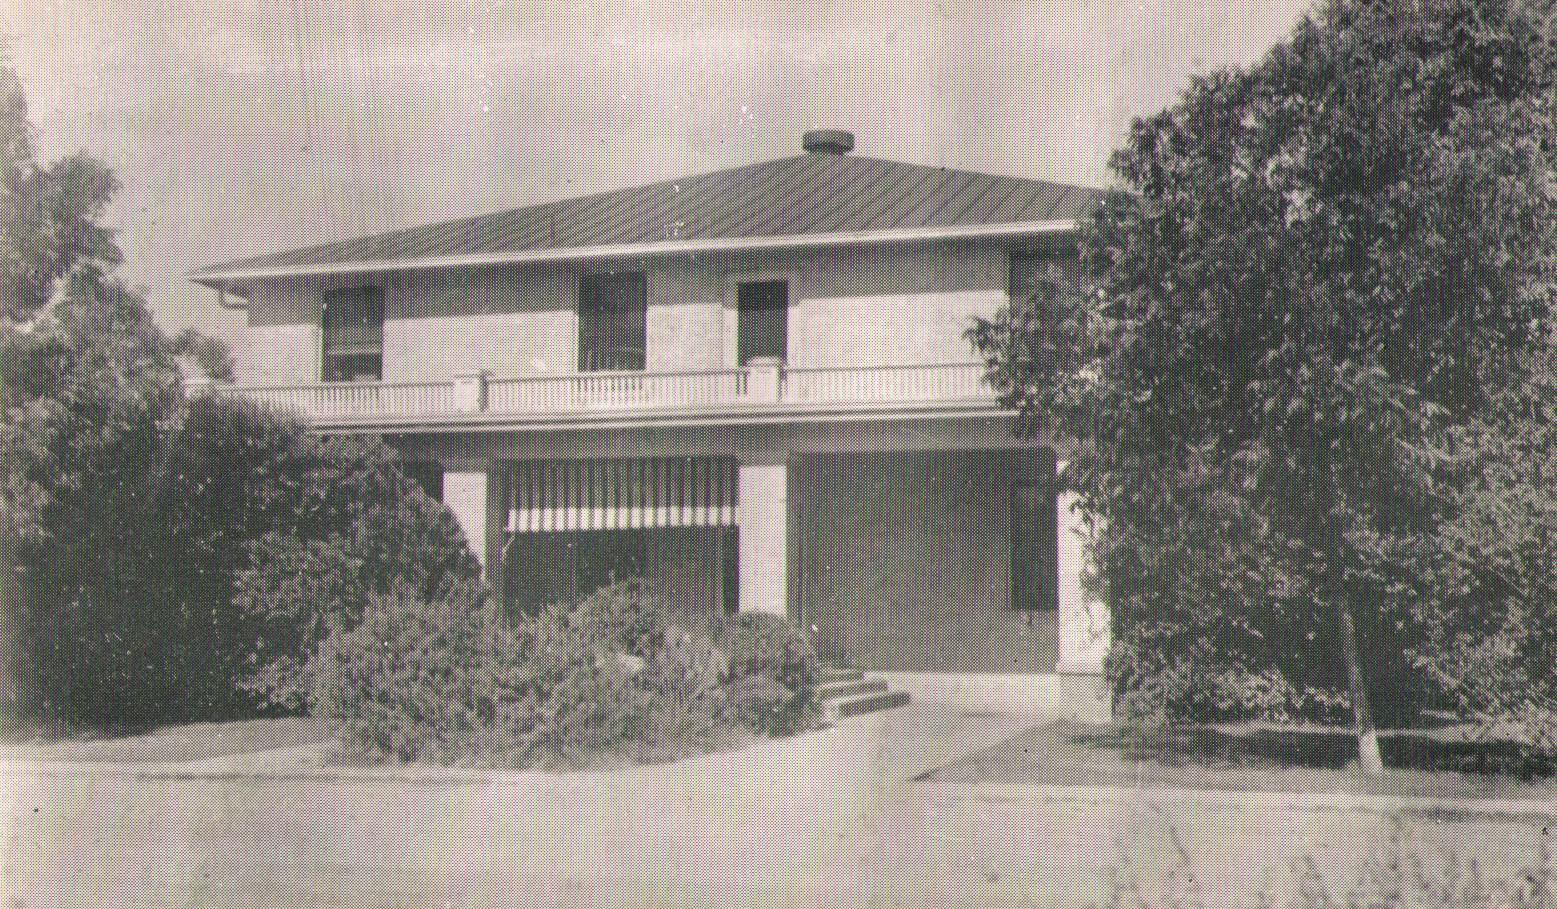 Bastrop F.A. Orgain Memorial Hospital